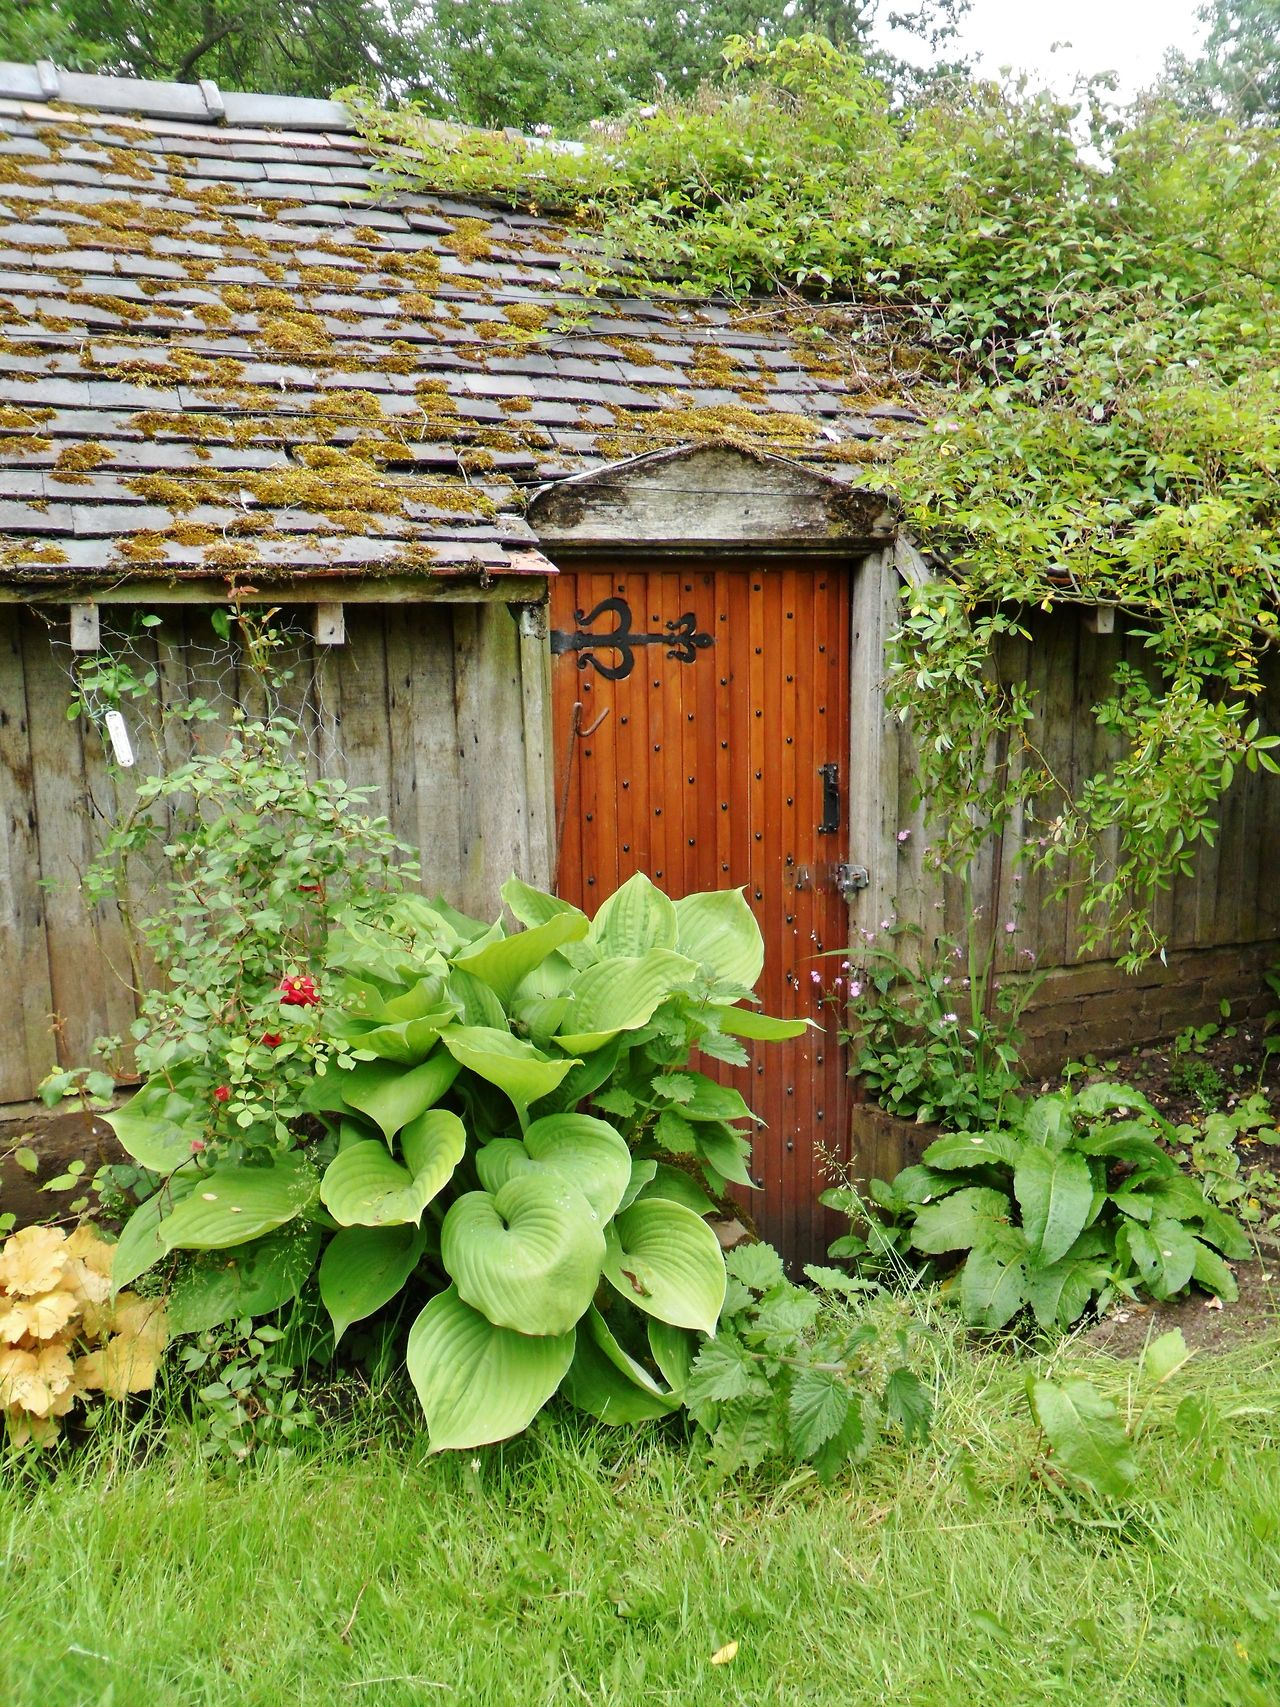 vwcampervan-aldridge: Overgrown Boathouse, Shugborough Hall ...